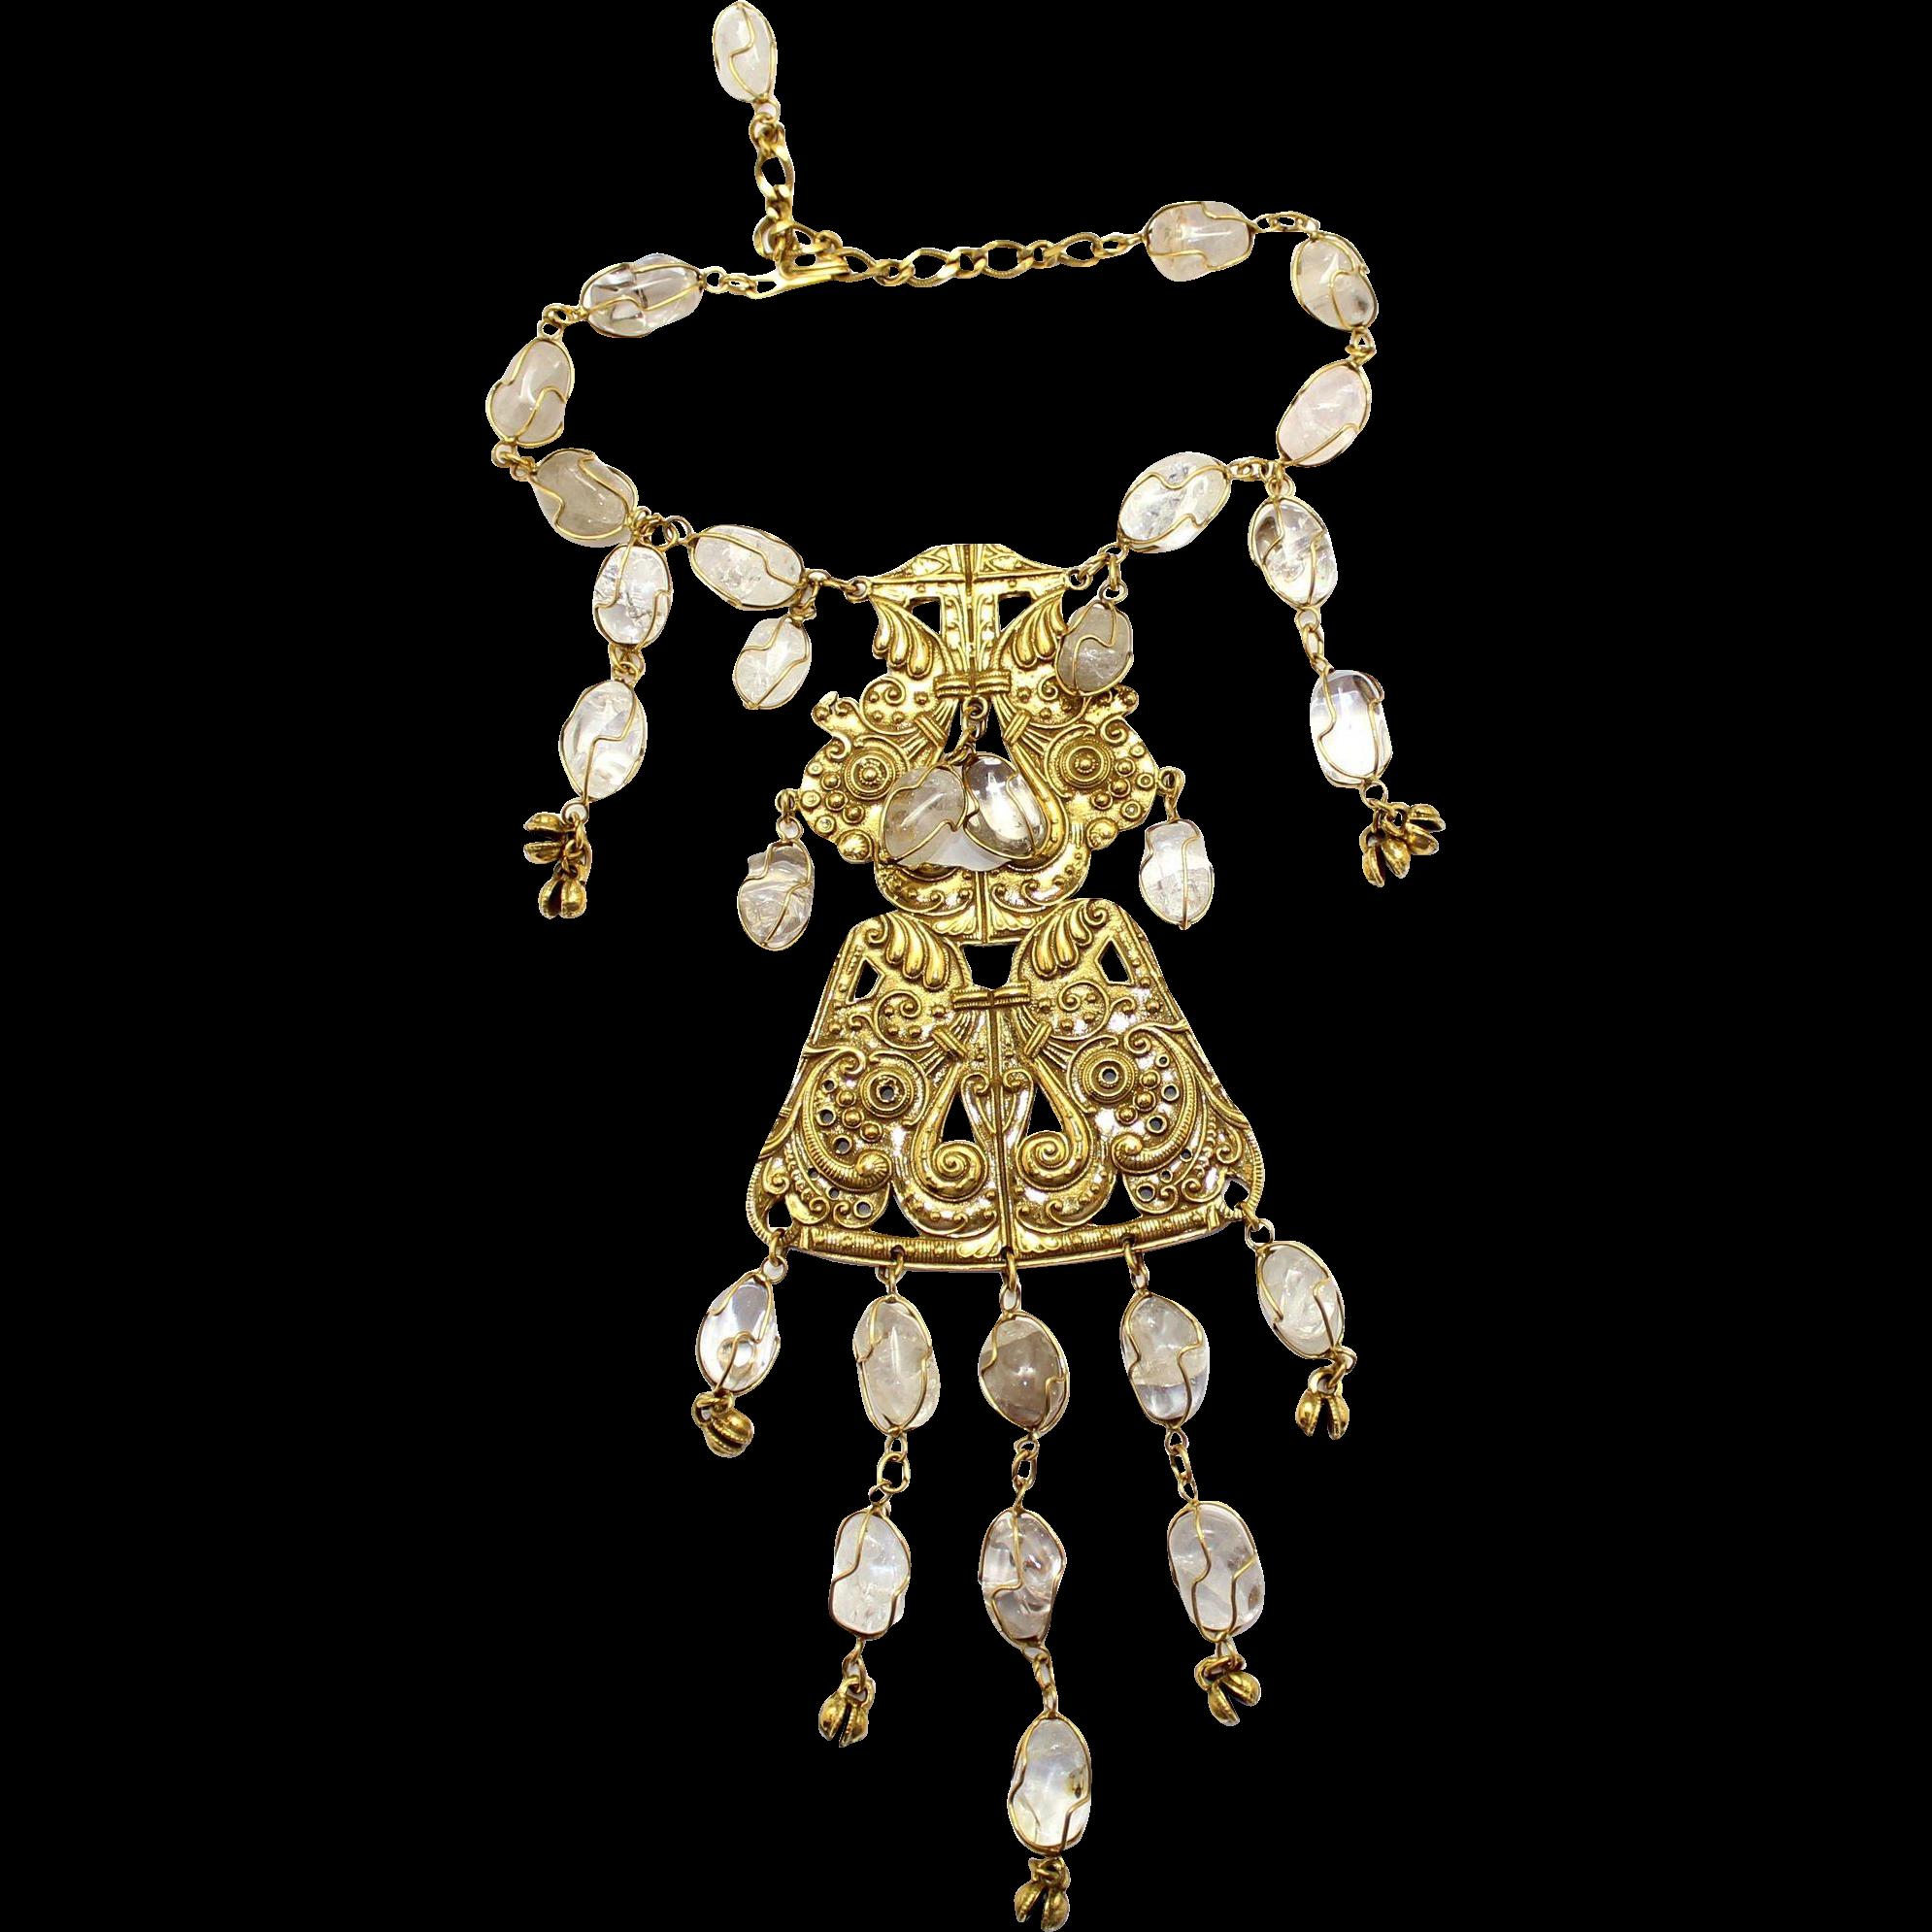 Vintage Huge Accessocraft Ethnic or Byzantine Rock Necklace